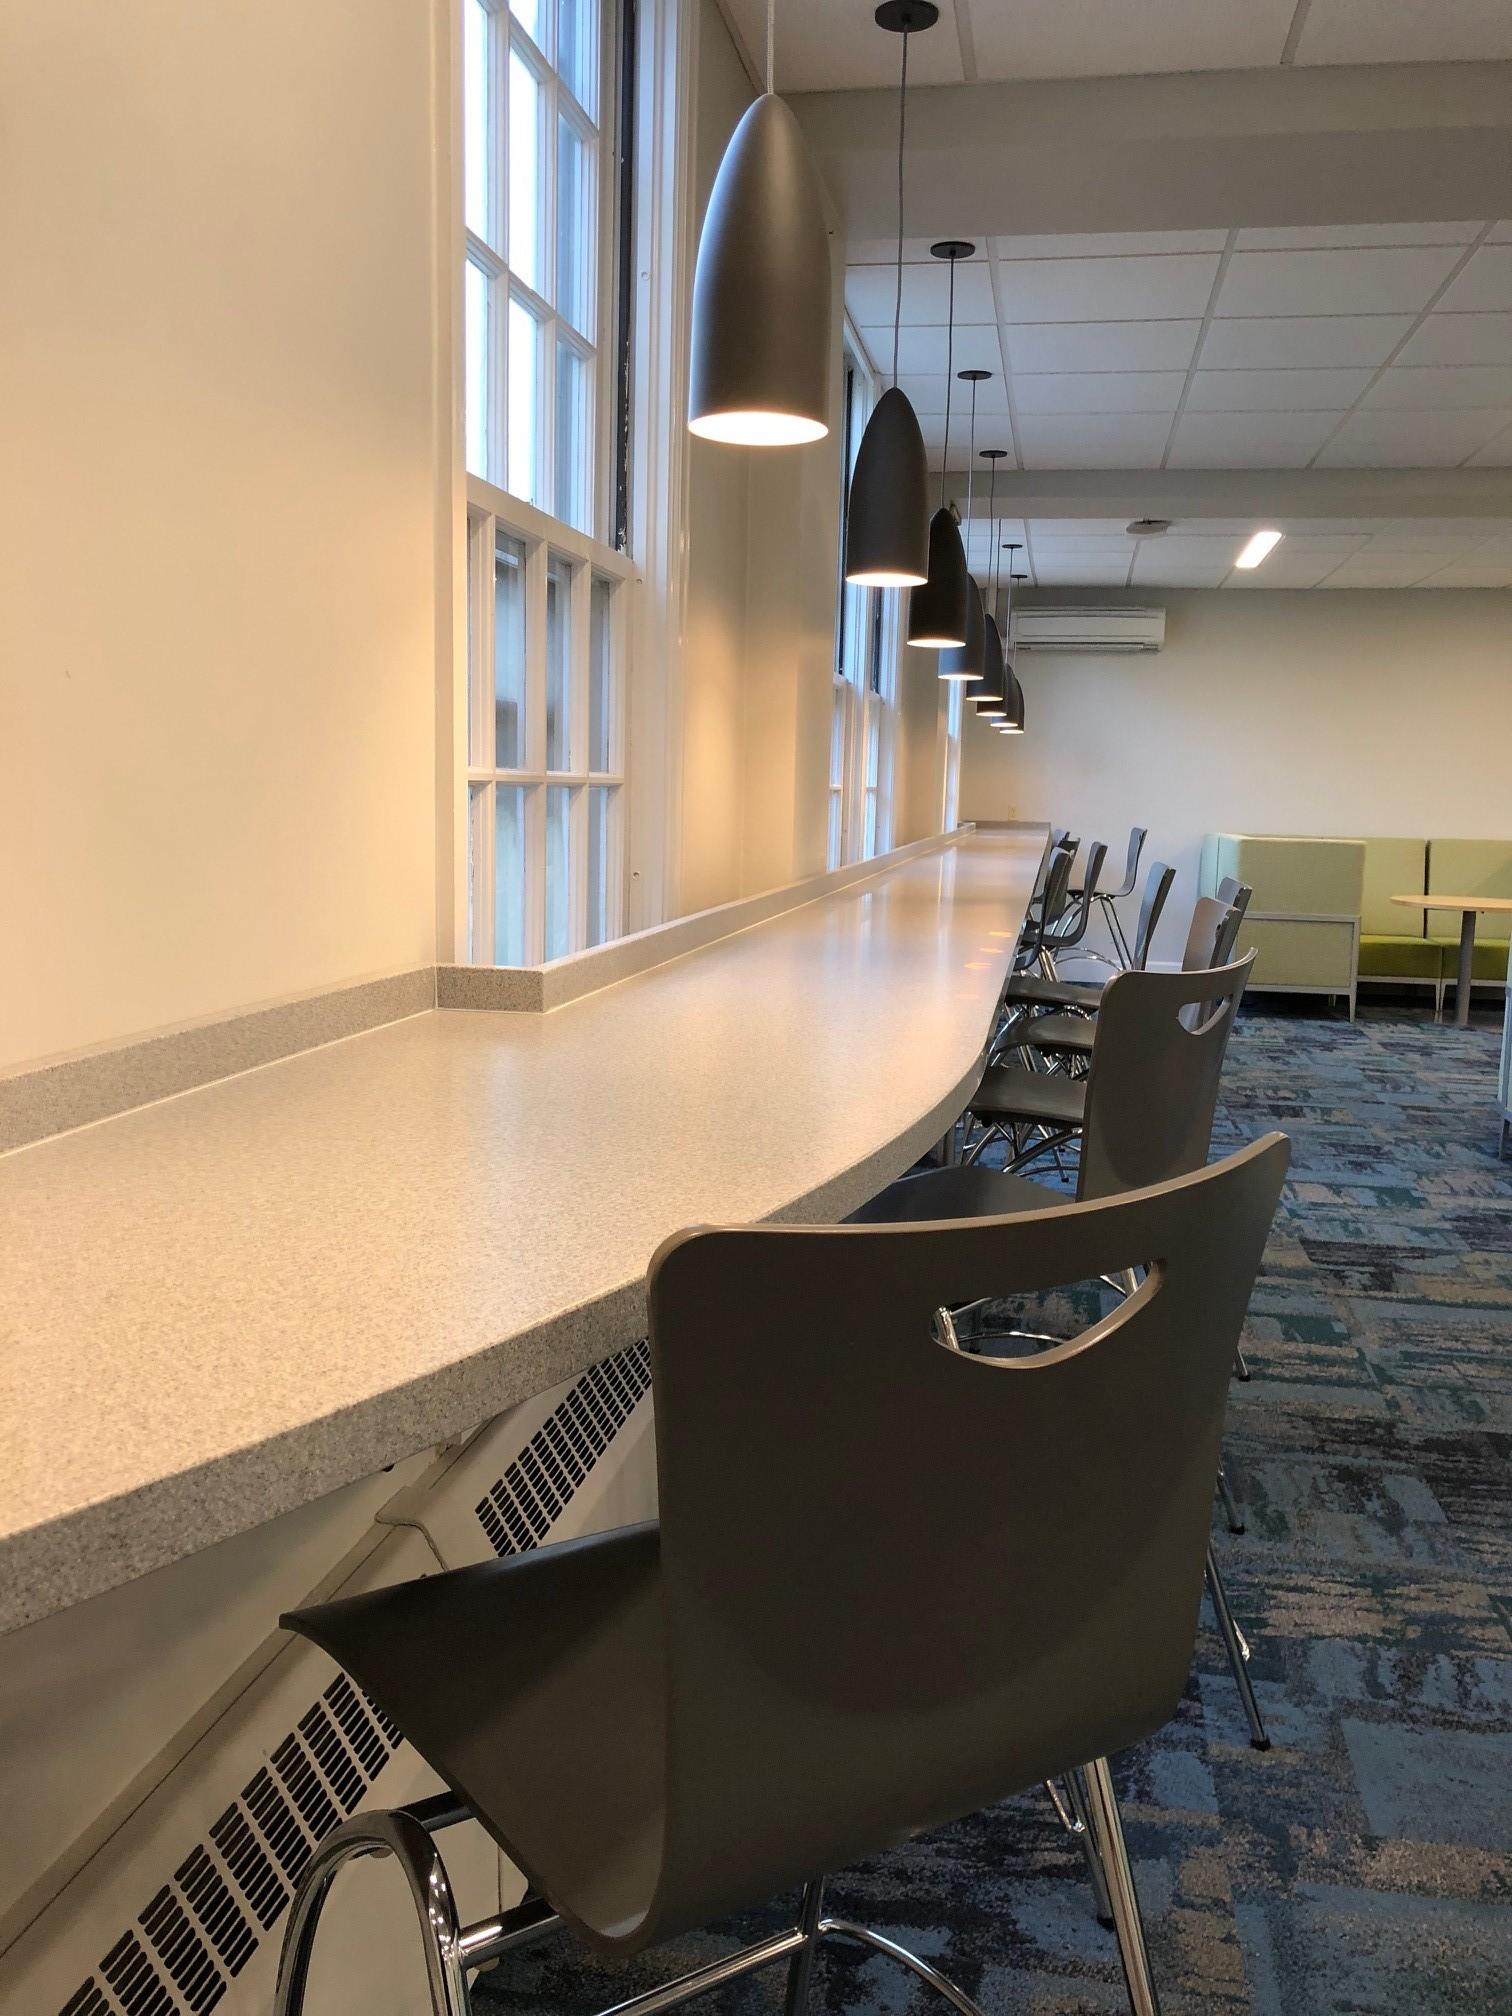 Elizabethtown College —Myer Hall dormitory